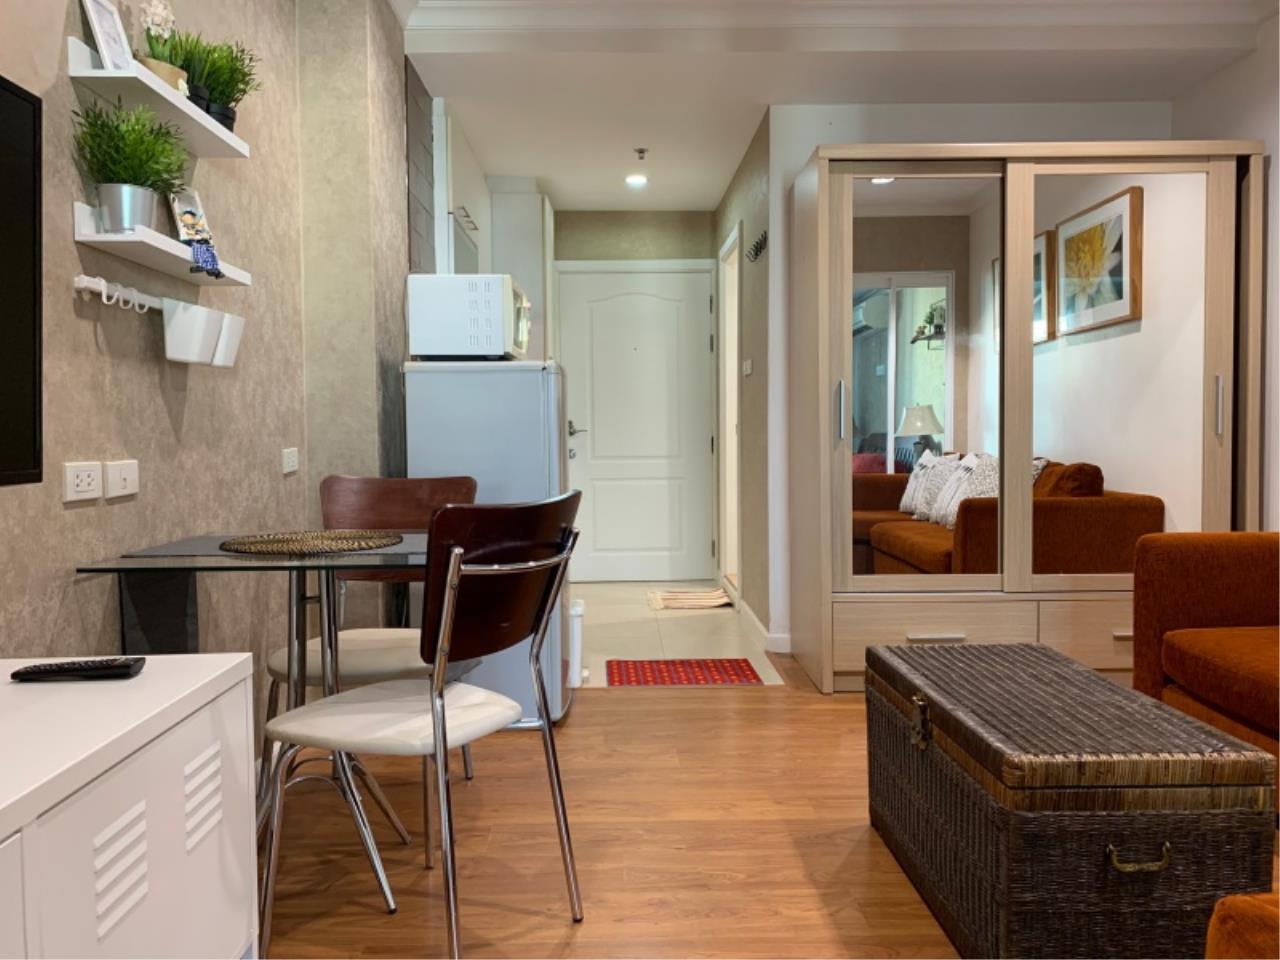 Century21 Skylux Agency's Grand Park View / Condo For Rent / 1 Bedroom / 35 SQM / MRT Blue Line / Bangkok 2